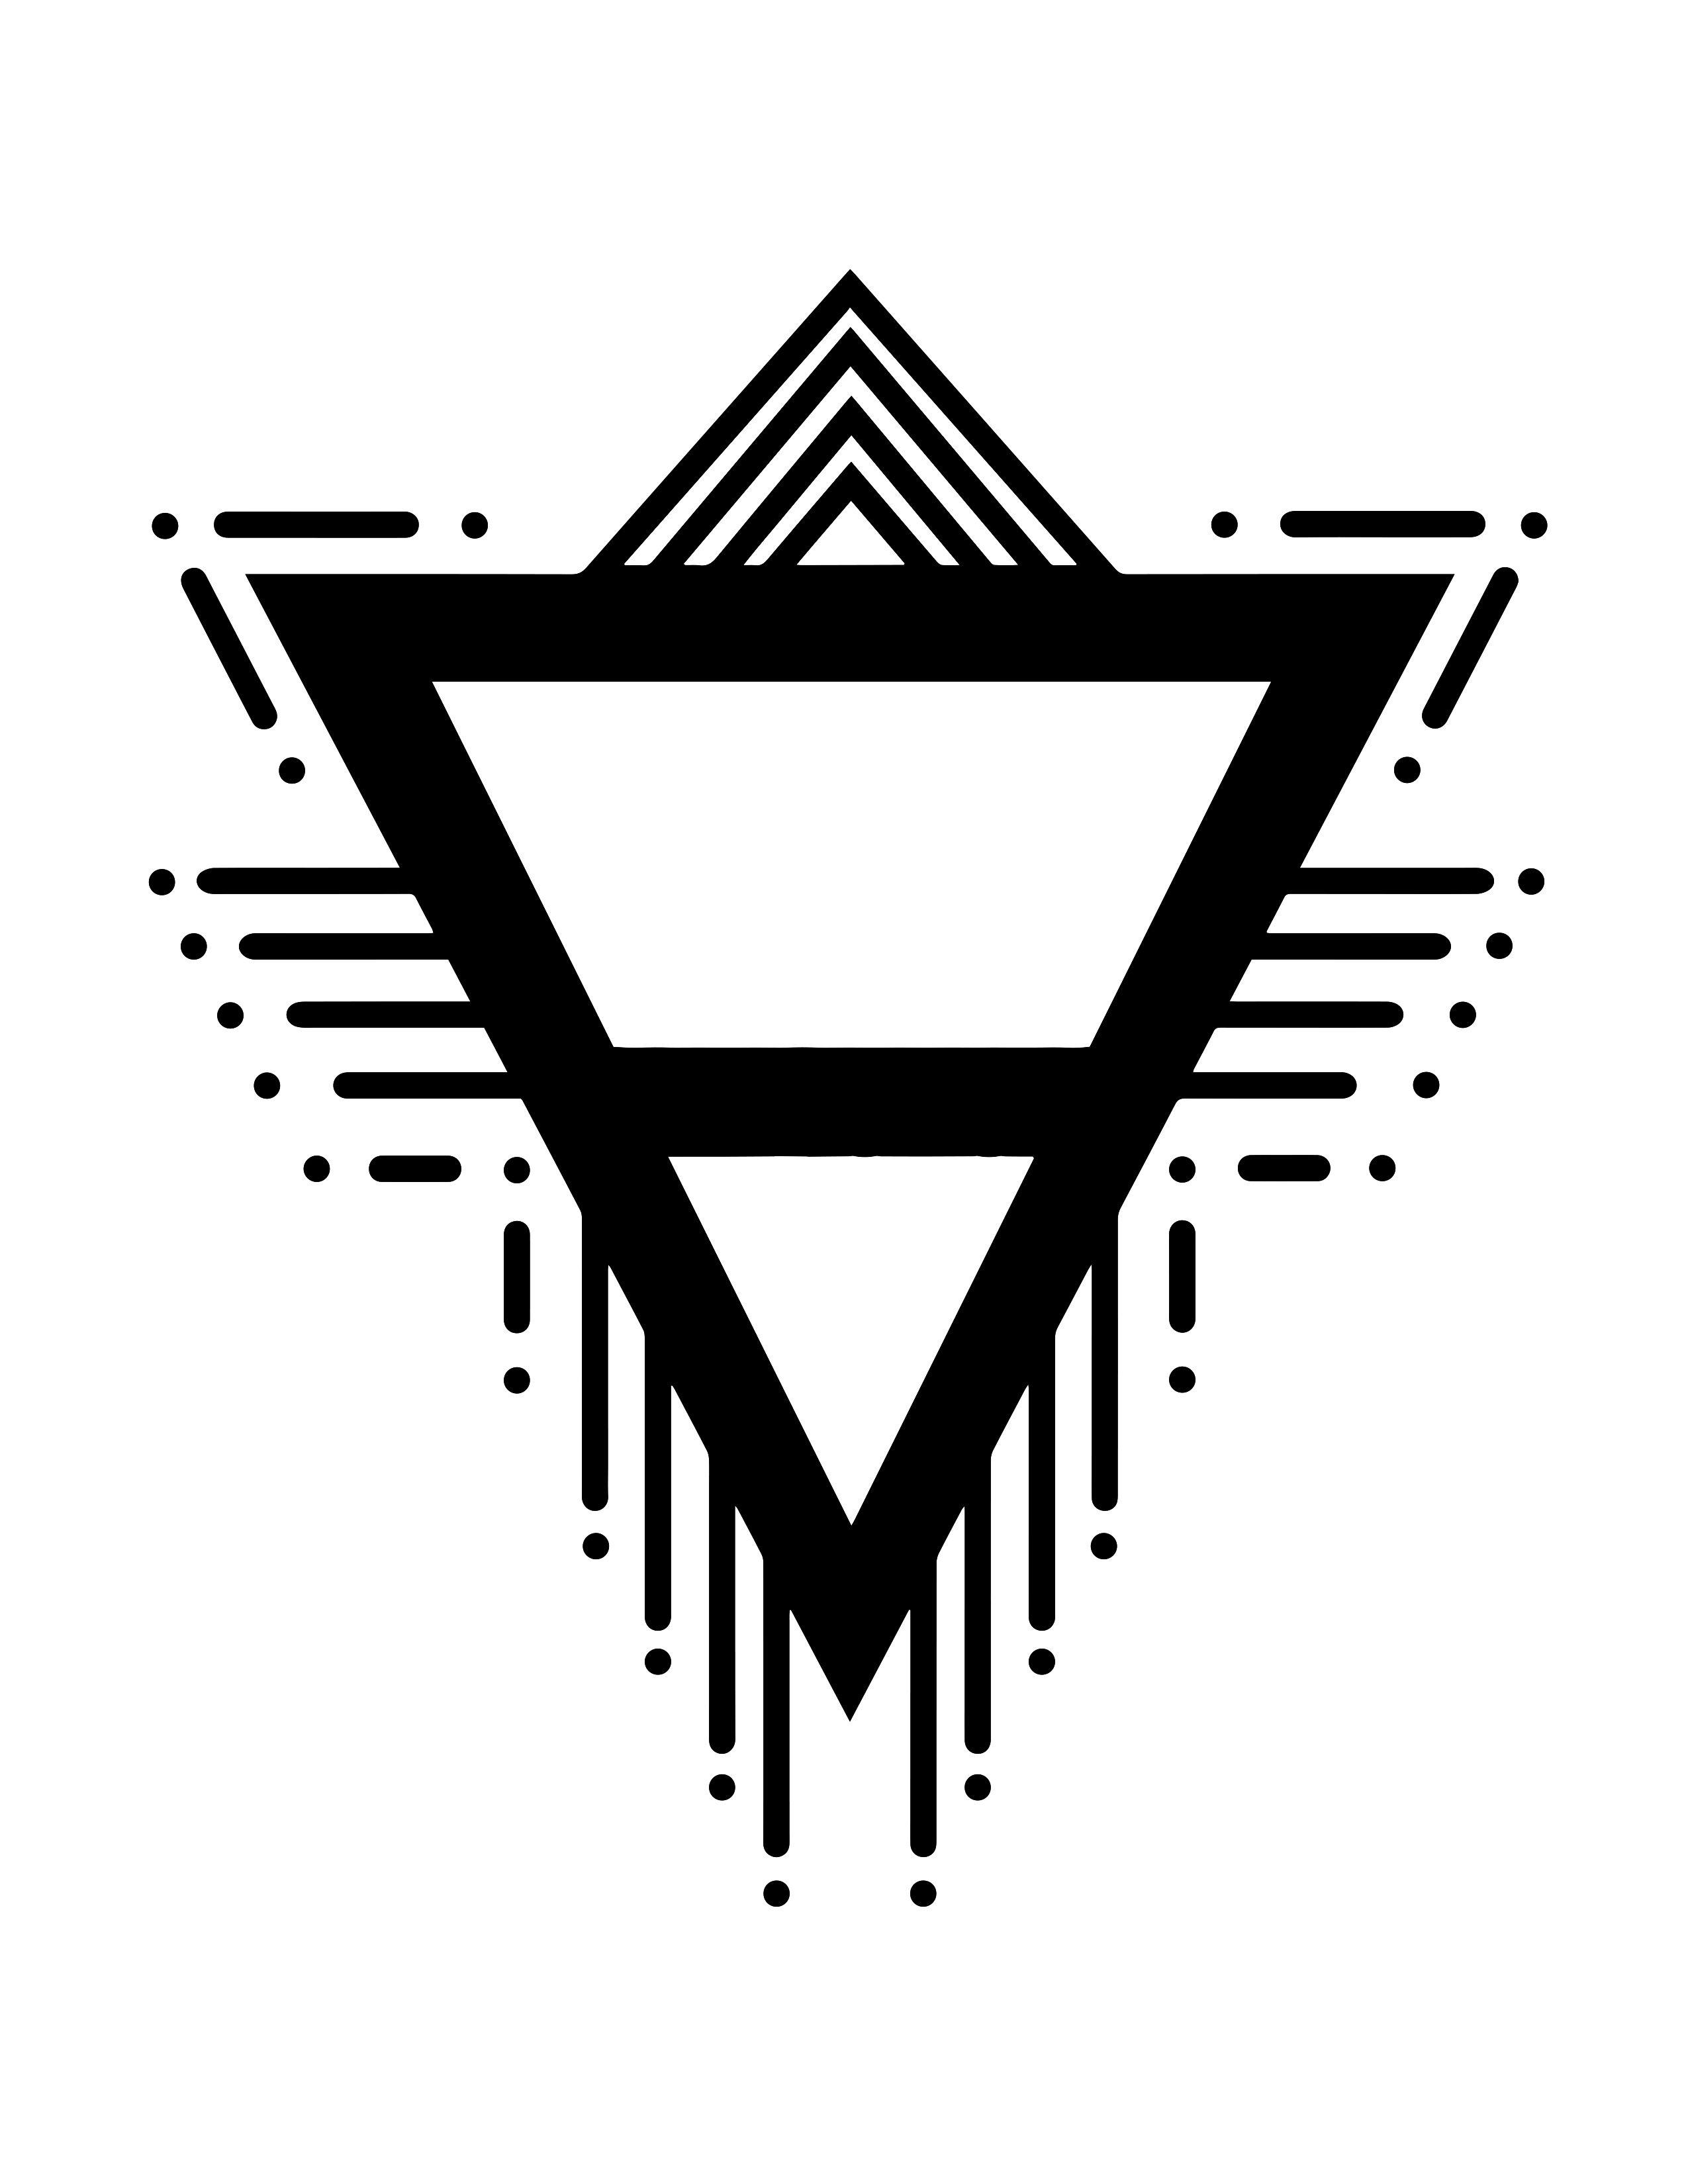 alchemy symbol for earth tattoo tattoo pinterest earth tattoo symbols and tattoo. Black Bedroom Furniture Sets. Home Design Ideas